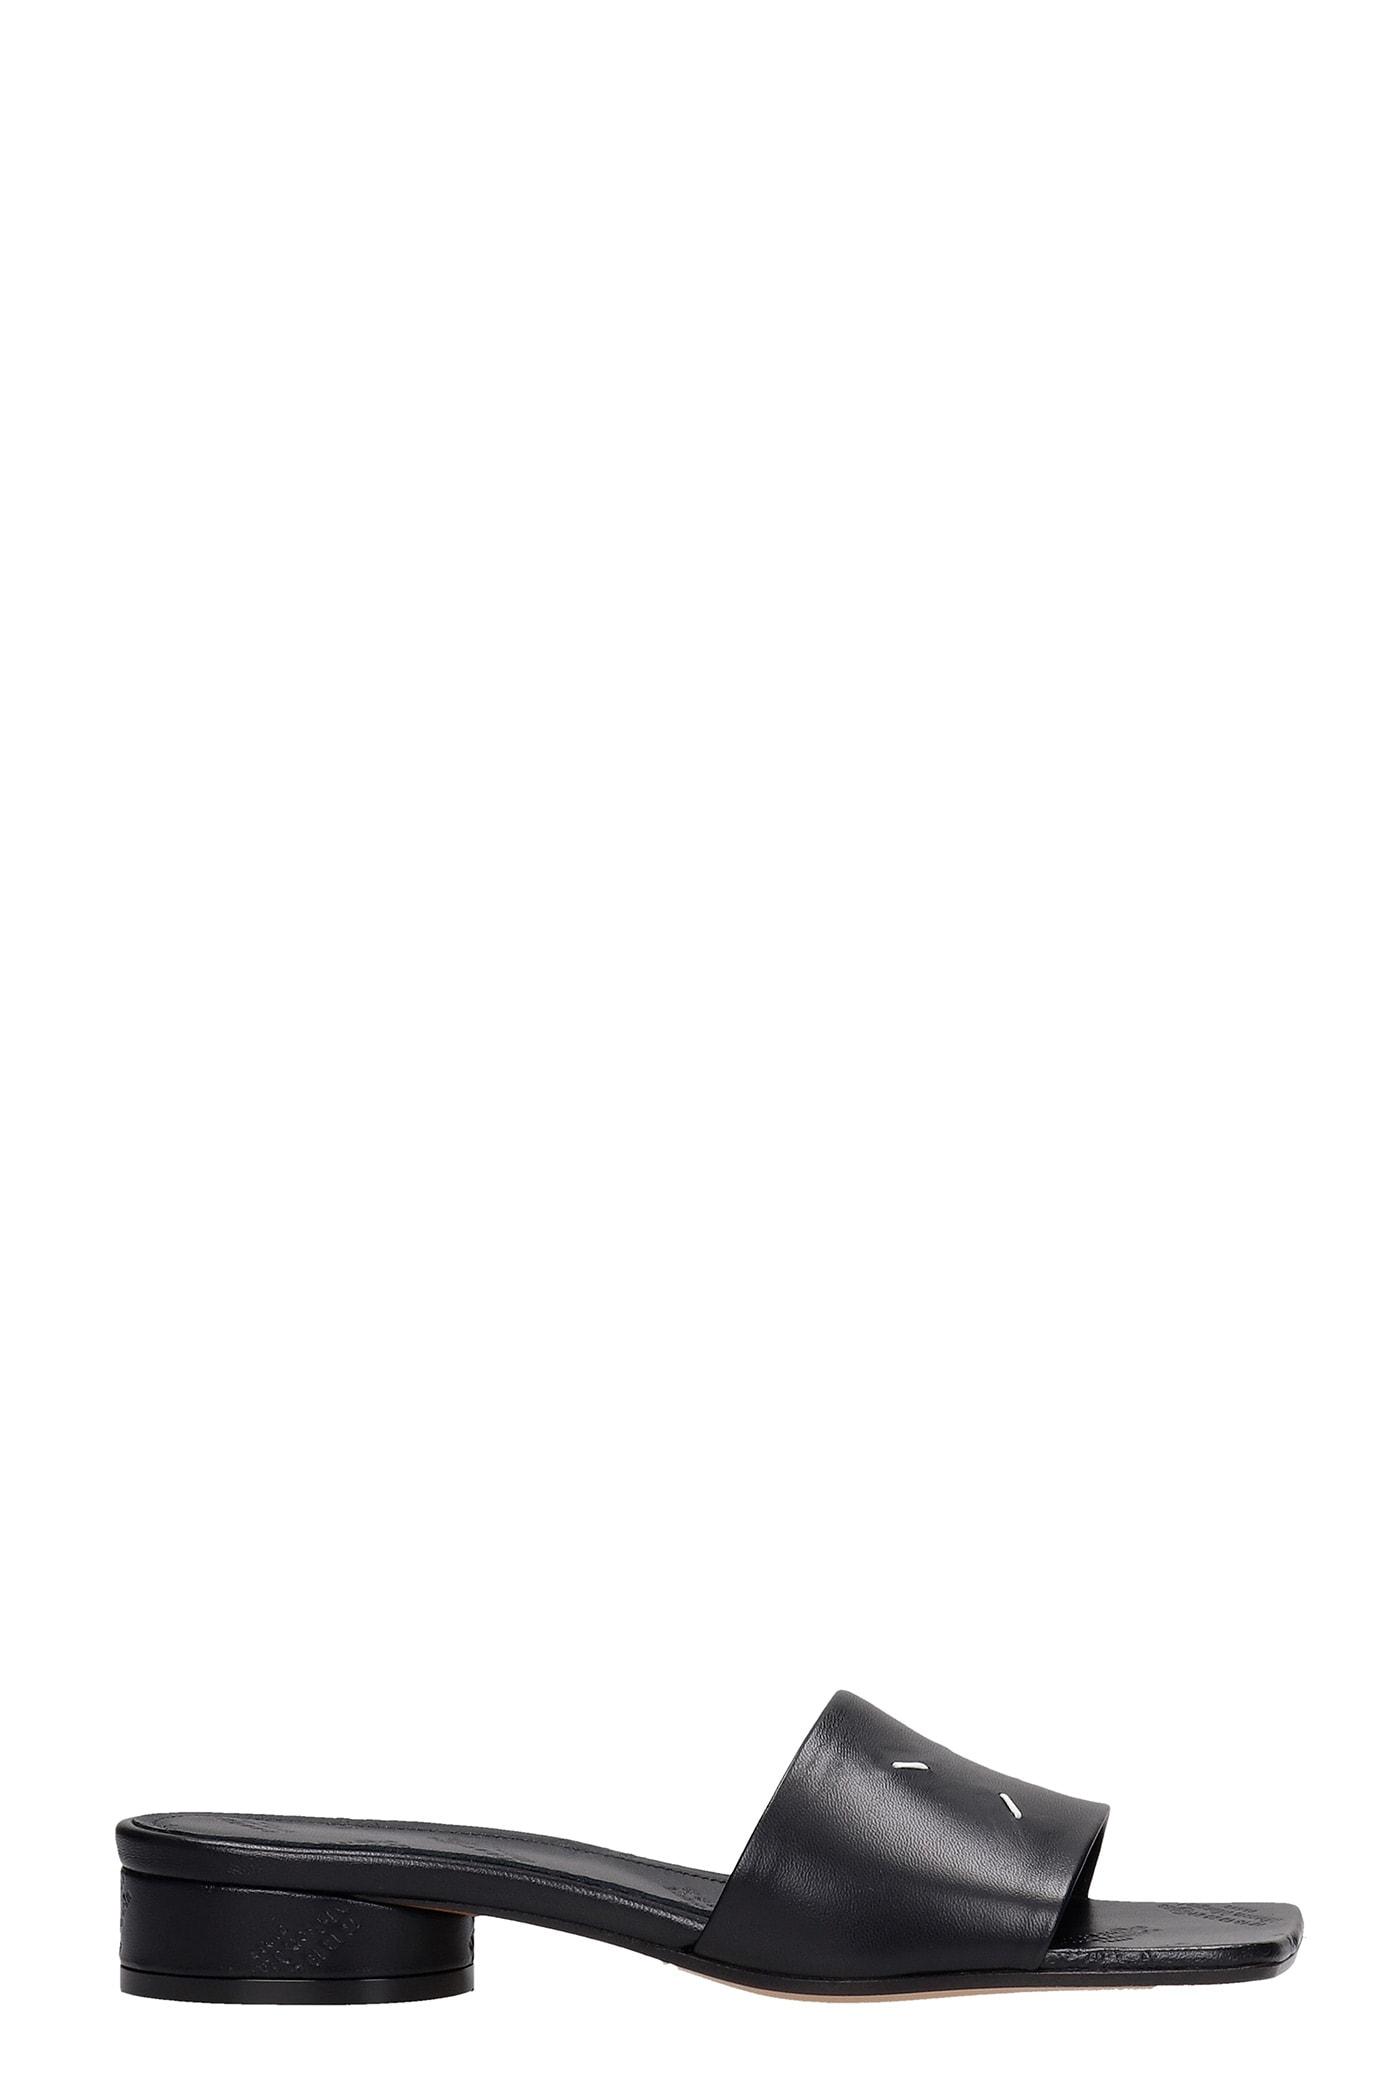 Buy Maison Margiela Flats In Black Leather online, shop Maison Margiela shoes with free shipping